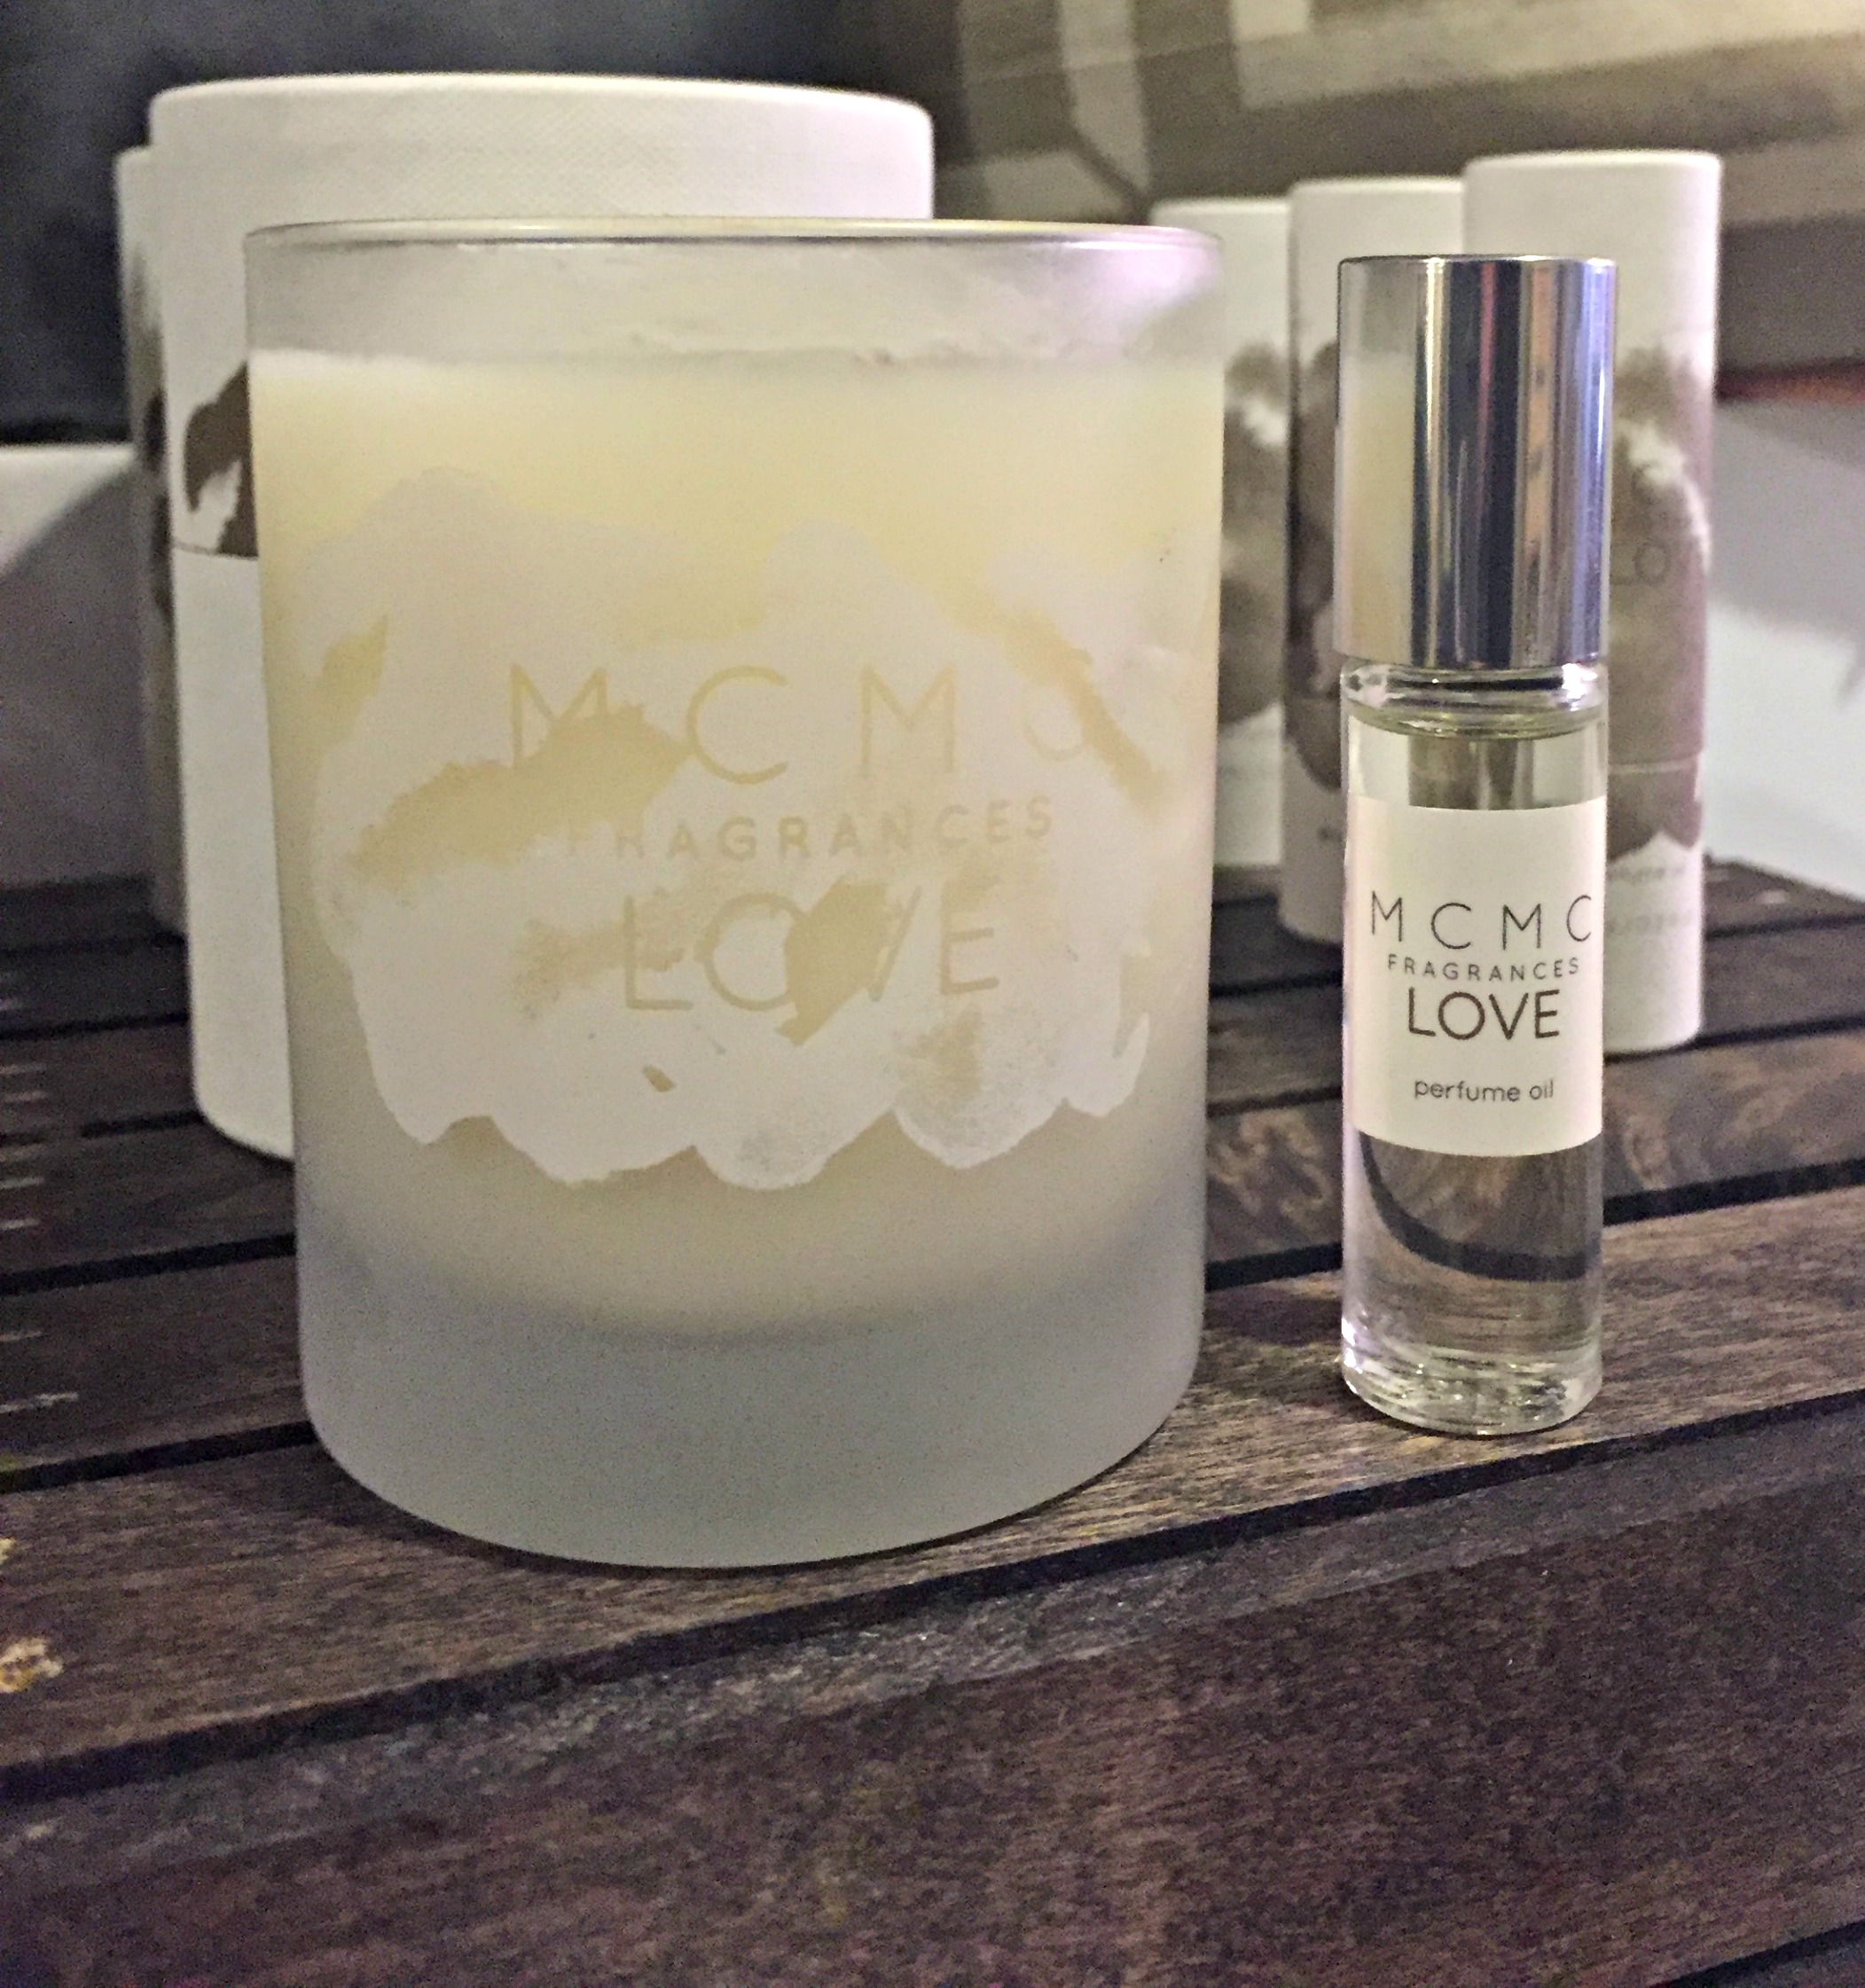 MCMC Fragrances